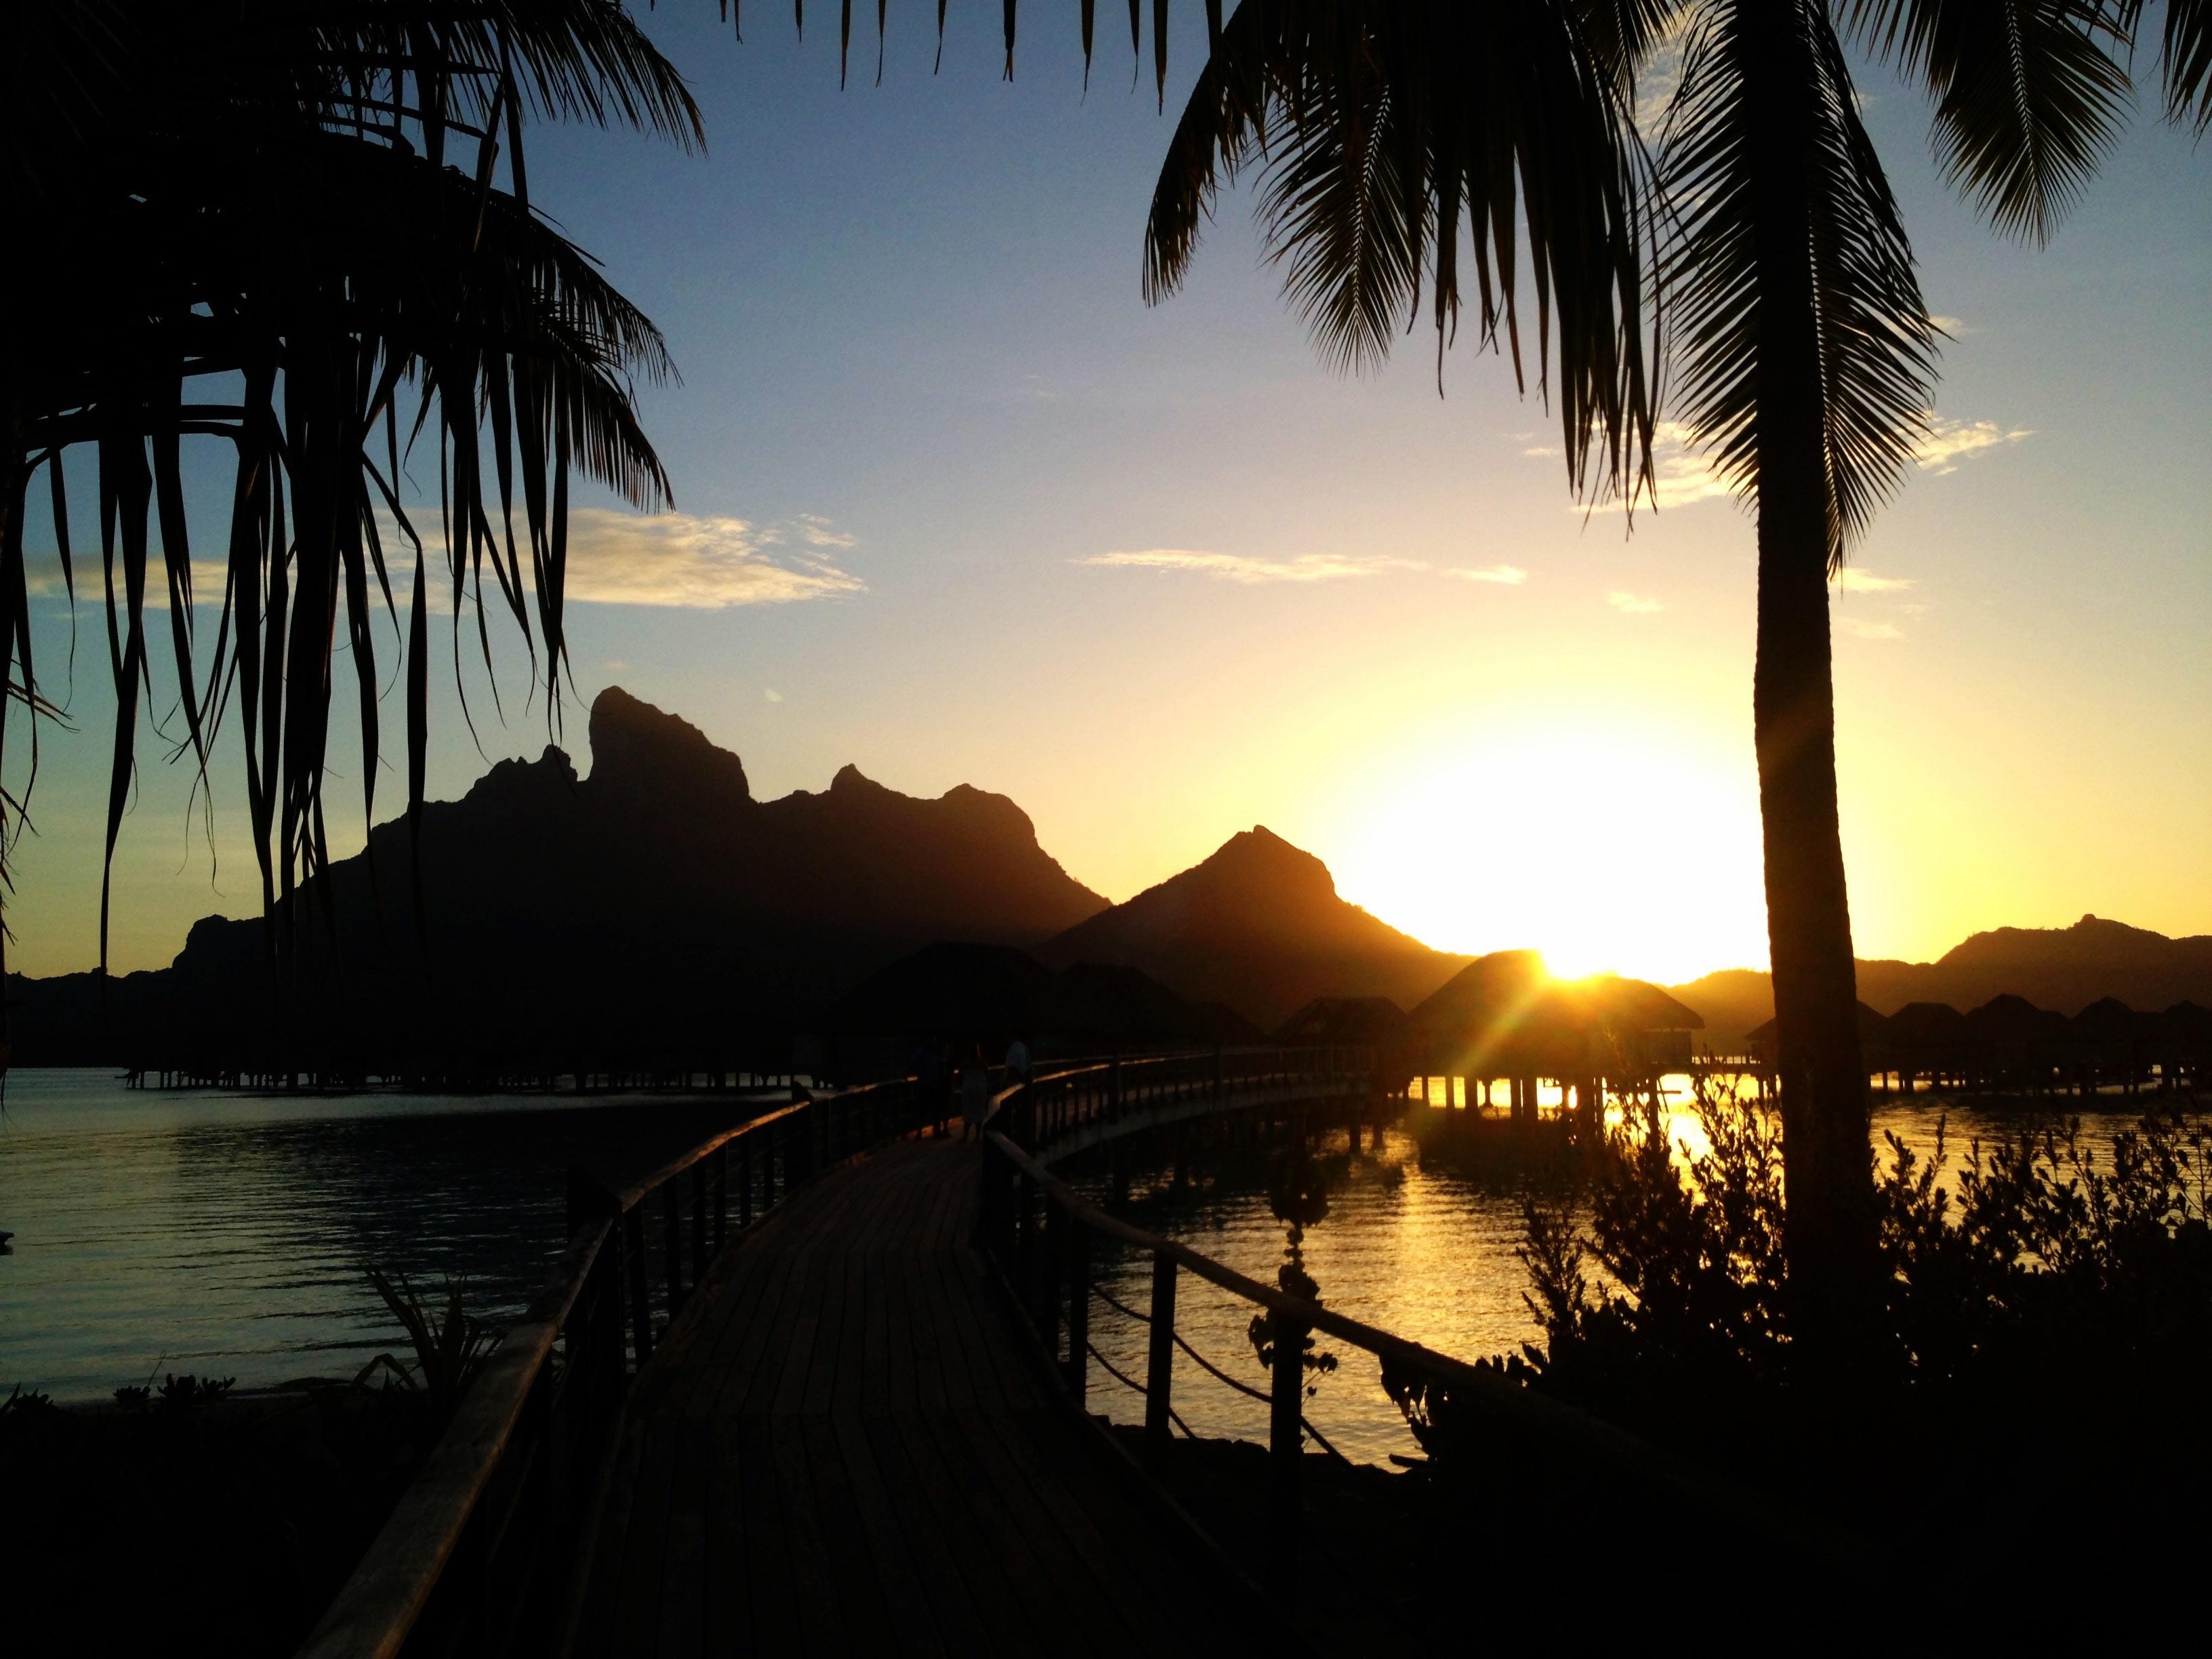 Looking through the palm trees at the bright orange sunset bursting through Mount Otemanu